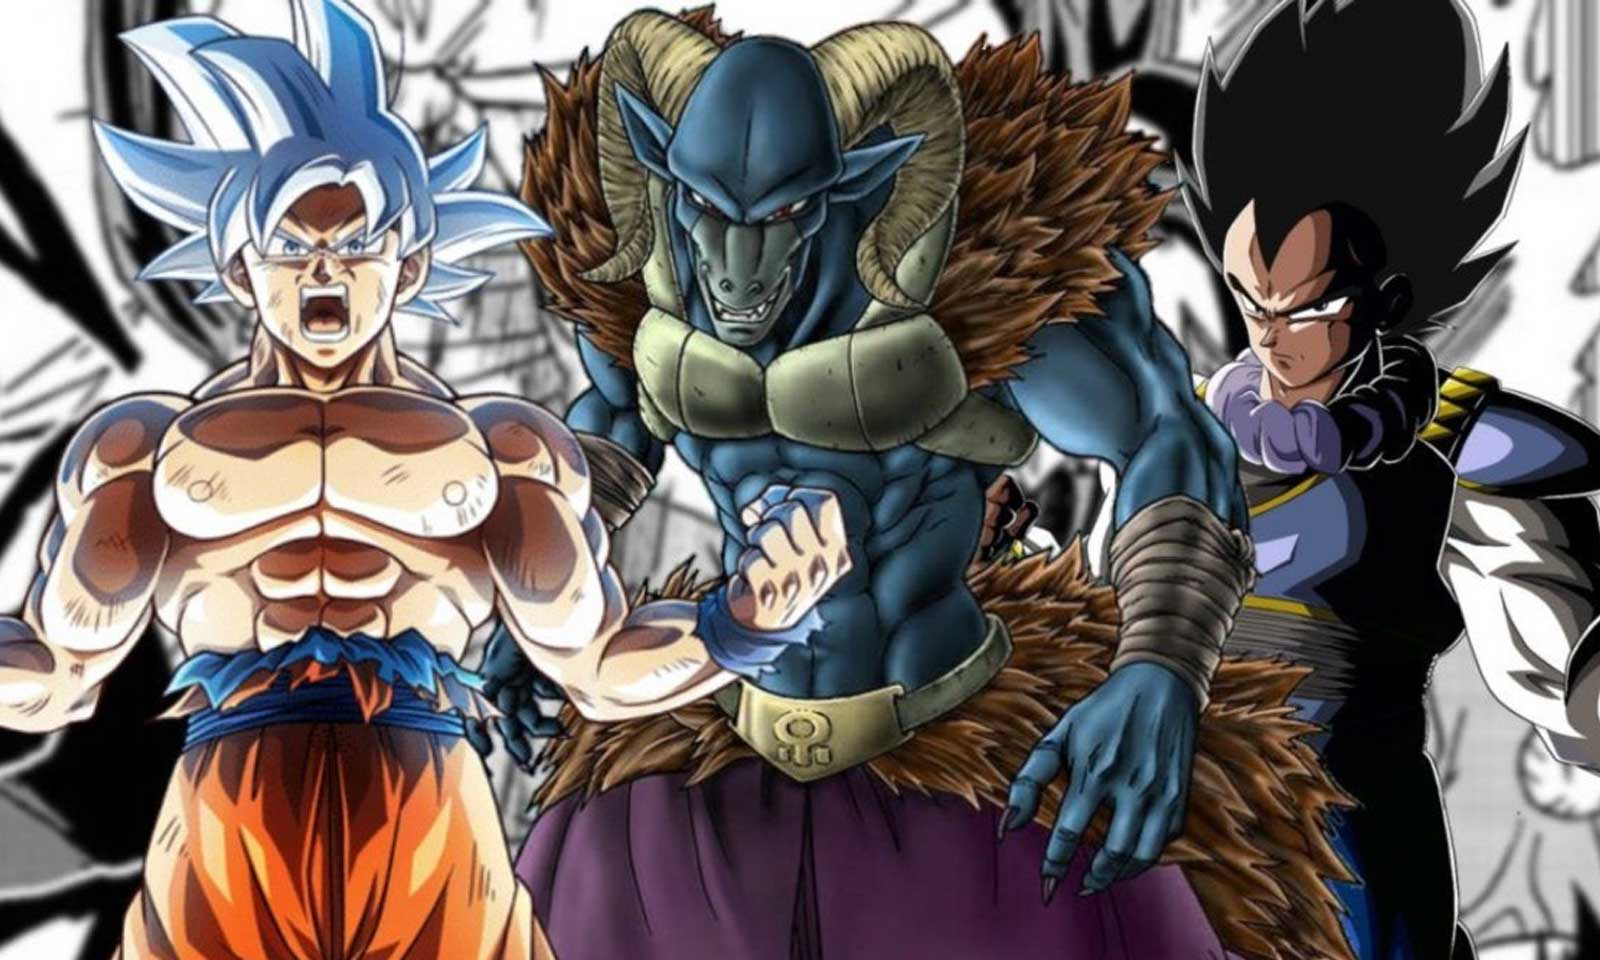 Dragon-Ball-Super-Moro-Chapter-64